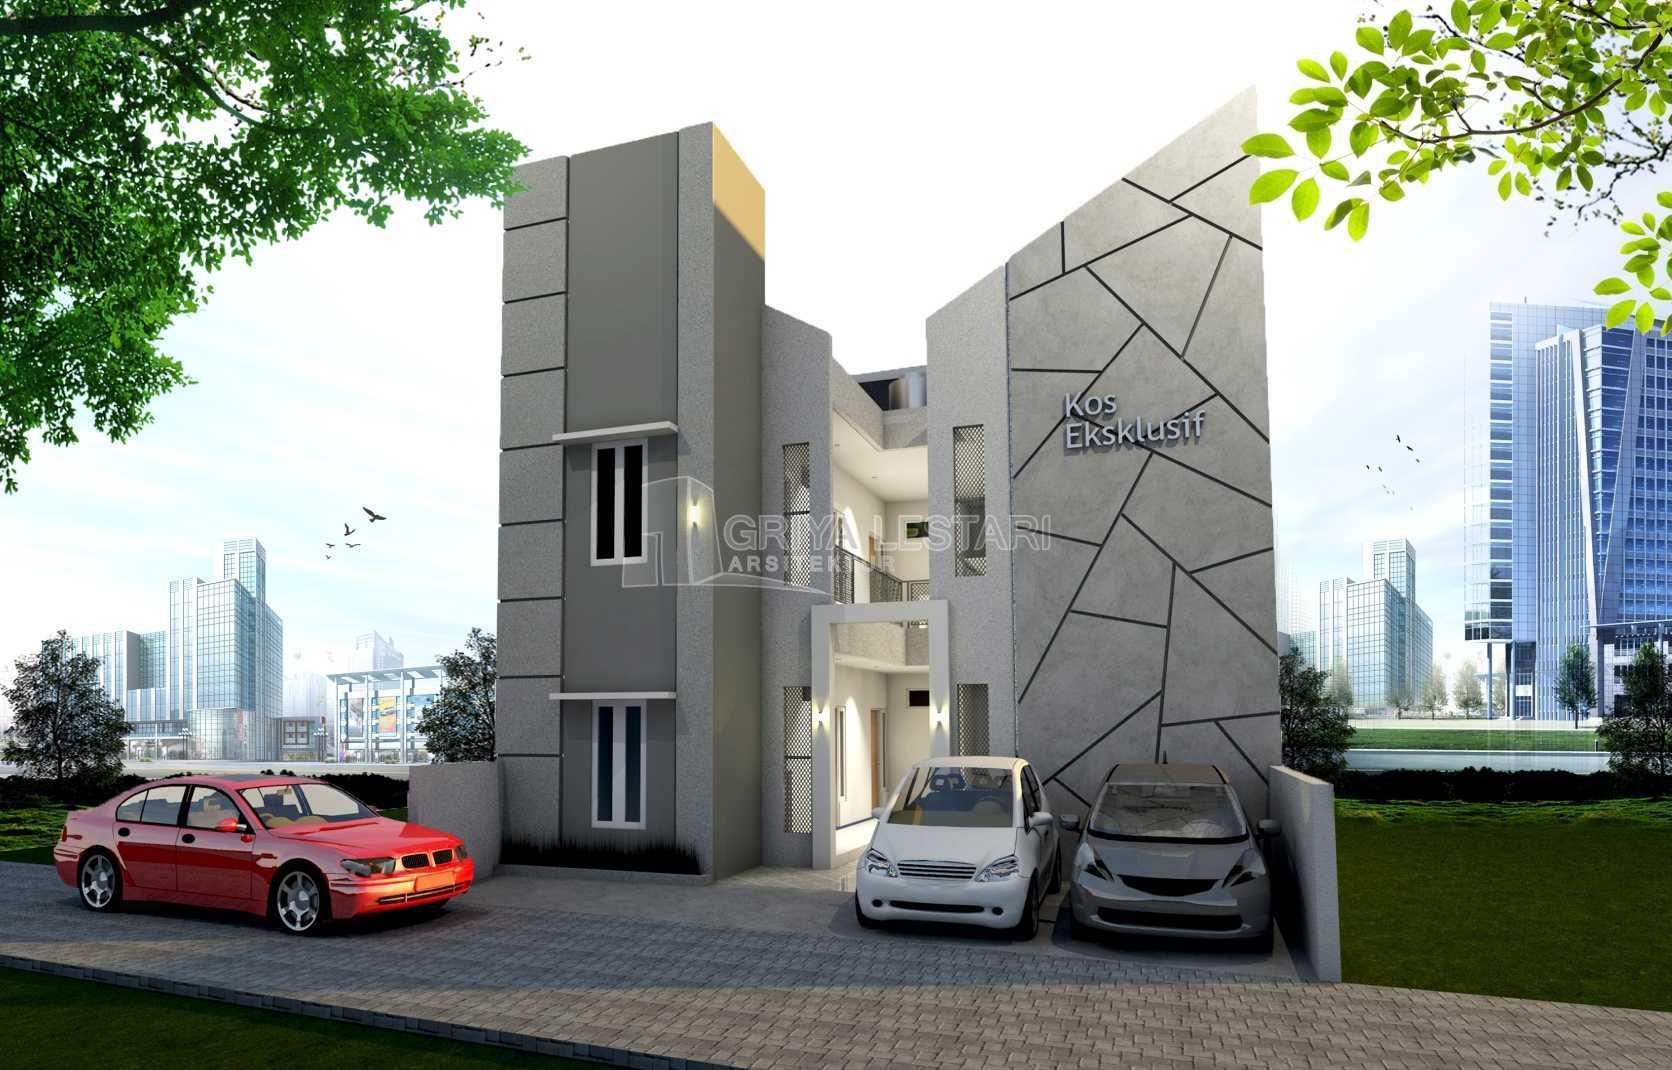 Project Desain Kos Kosan Eksklusif Desain Arsitek Oleh Griya Lestari Arsitektur Arsitag